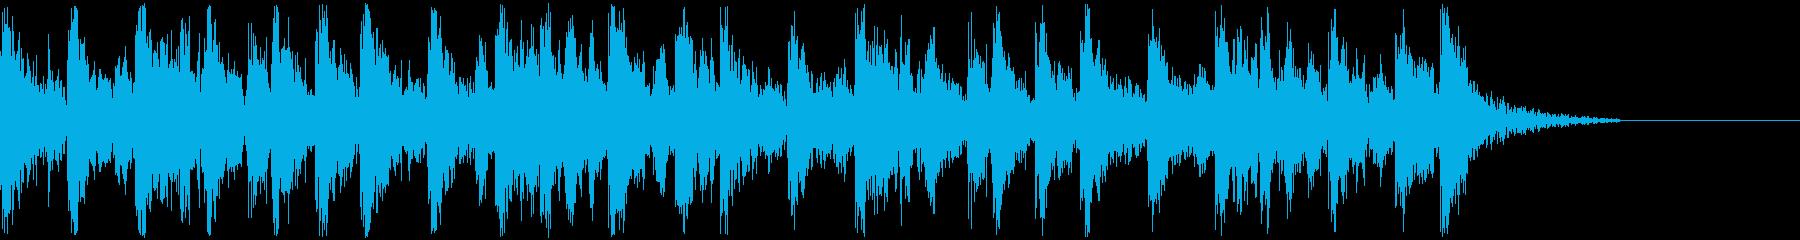 【JG】緊迫感のあるジングル01の再生済みの波形